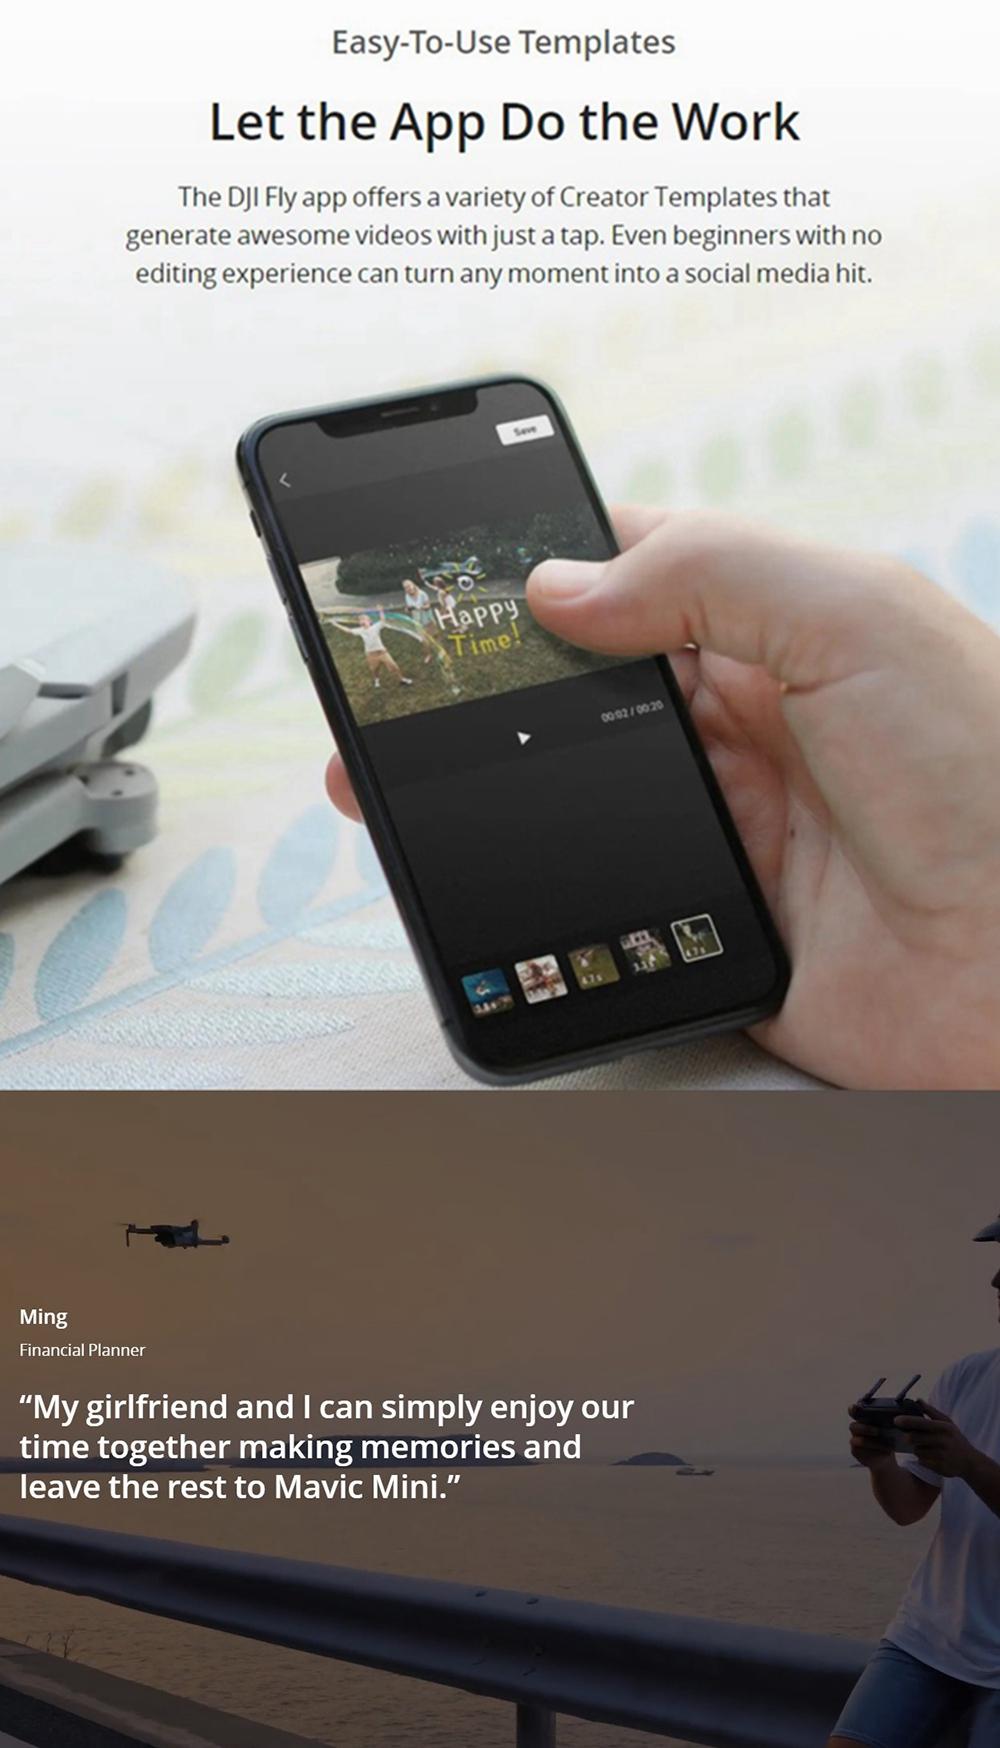 DJI Mavic Mini 4KM FPV with 2.7K Camera 3-Axis Gimbal 30mins Flight Time 249g Ultralight GPS RC Drone Quadcopter RTF 18